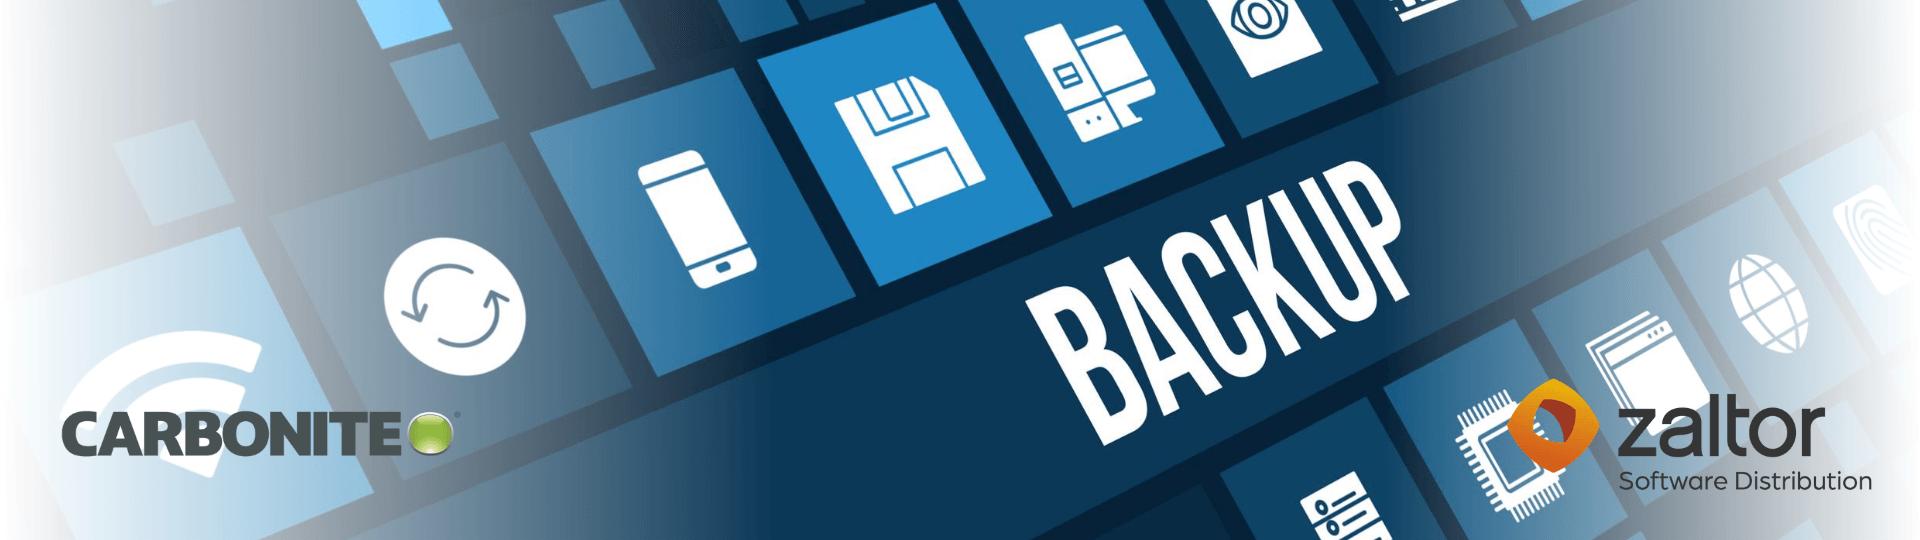 software carbonite backup office 365 zaltor